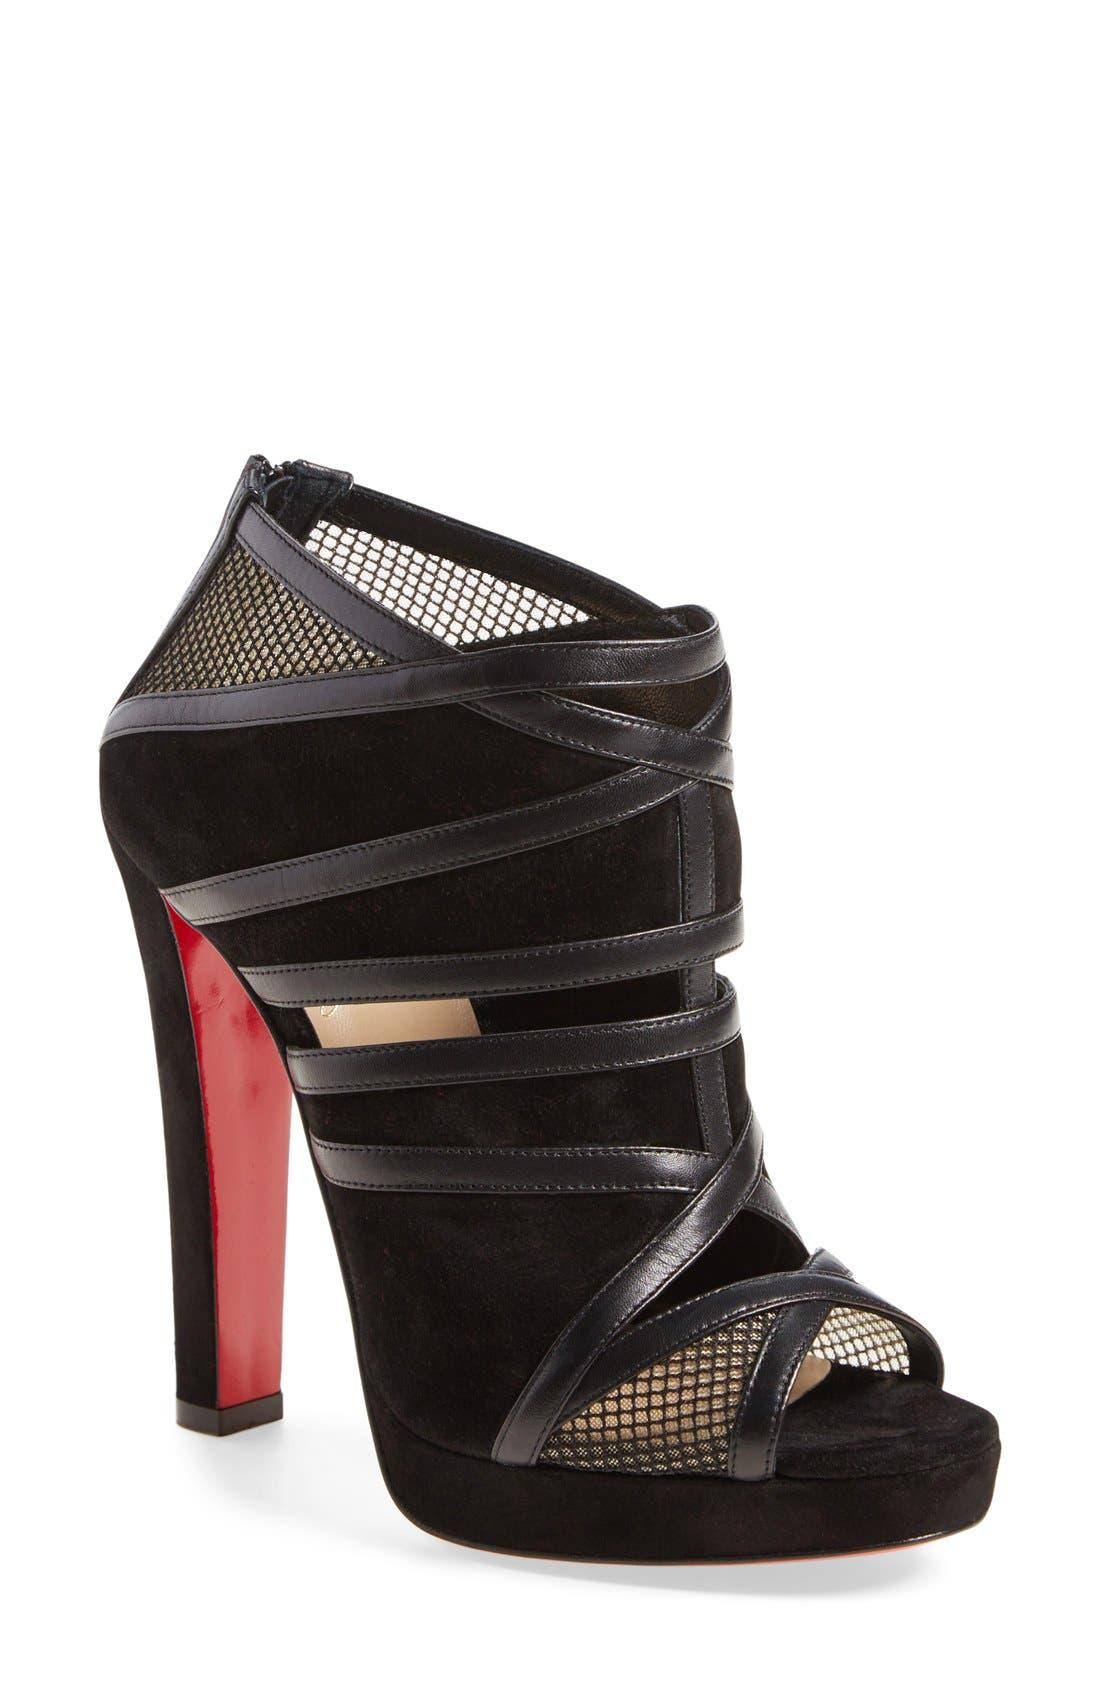 Alternate Image 1 Selected - Christian Louboutin 'Cammandanta' Open Toe Platform Sandal